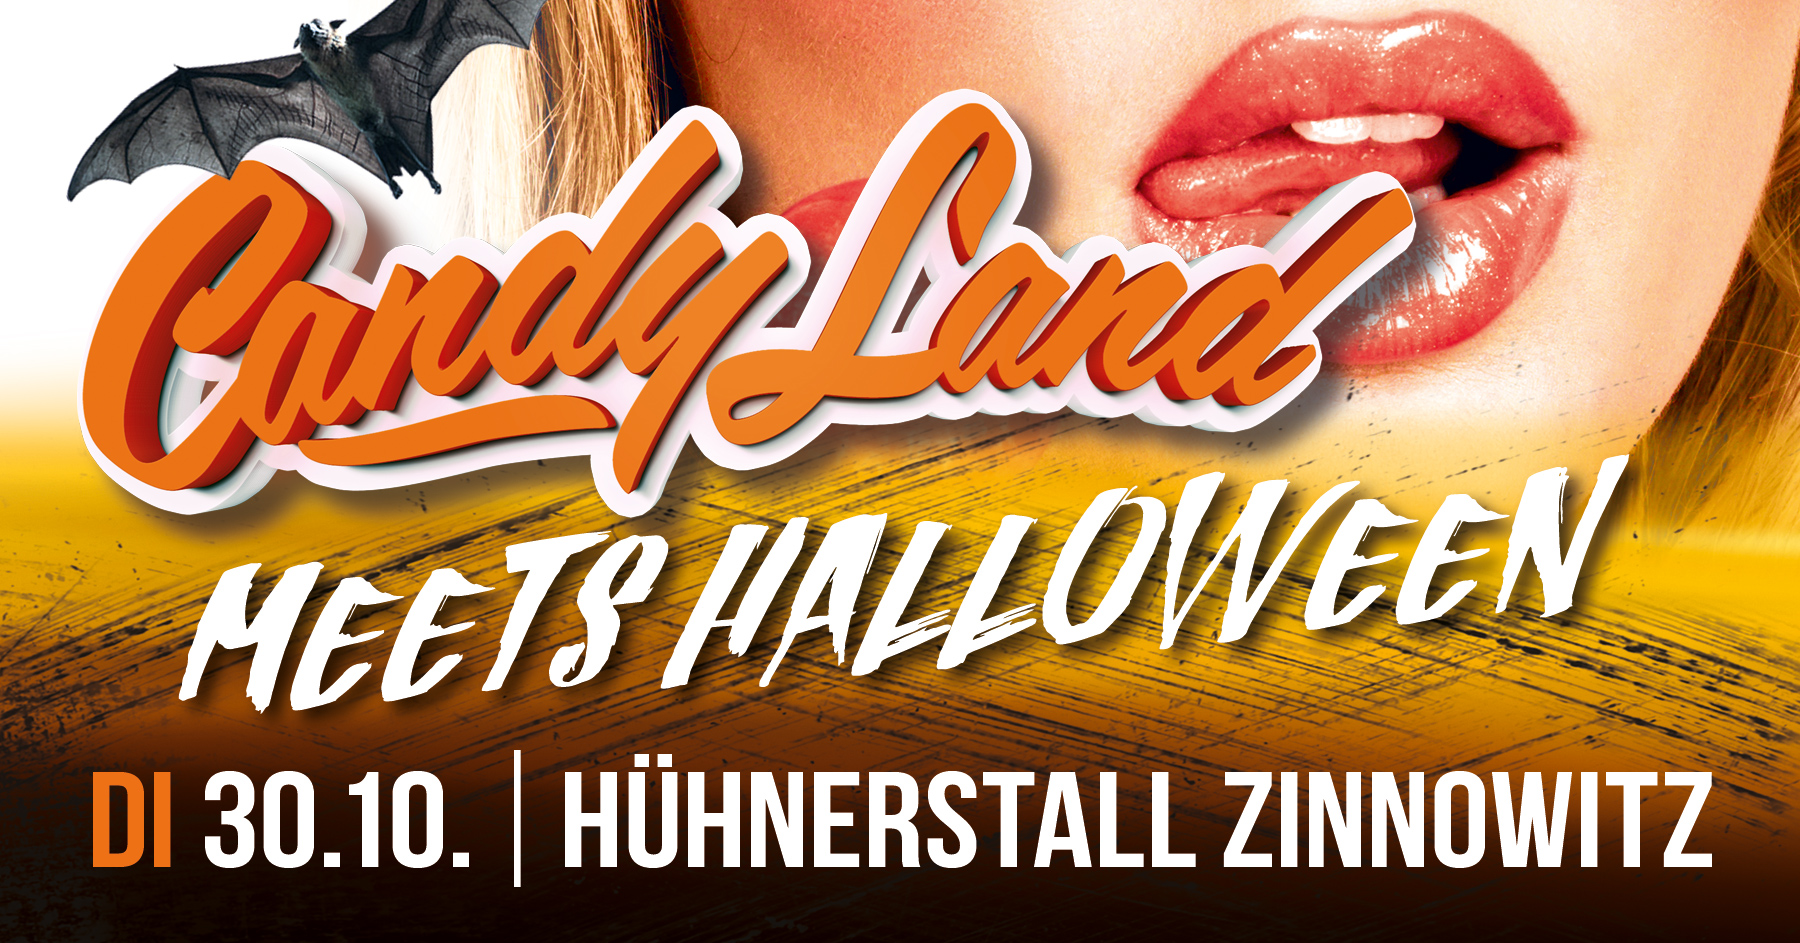 Candy Land meets Halloween